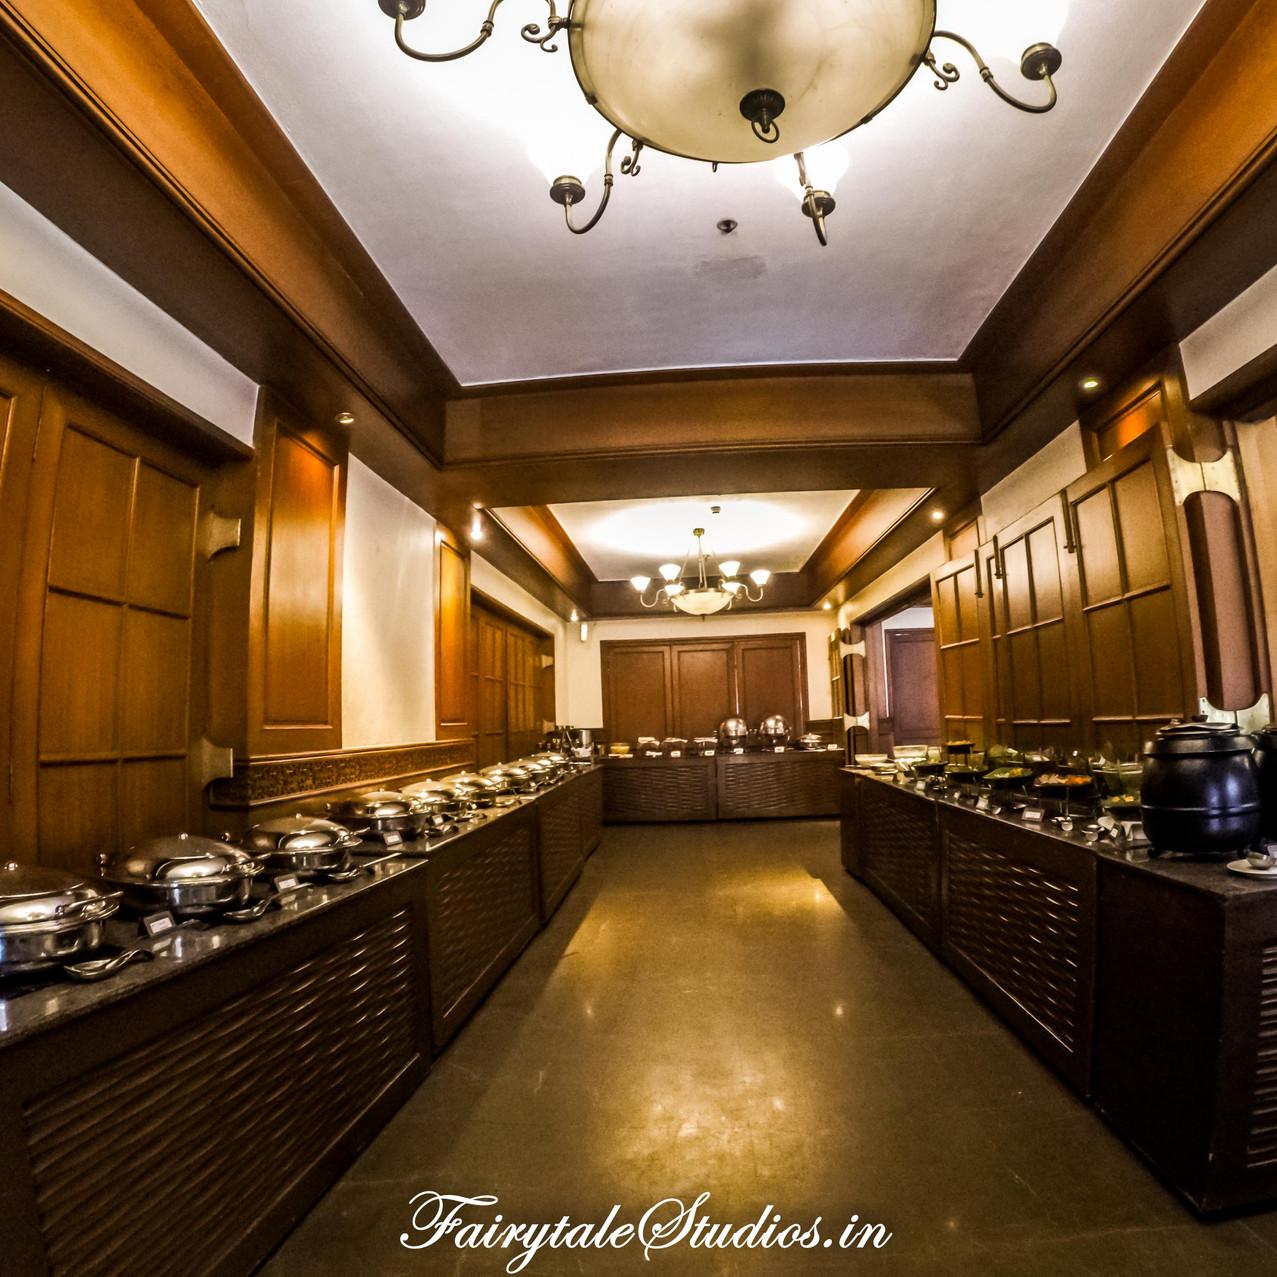 Restaurant_The Carlton Kodaikanal_Fairytale Travels (1)